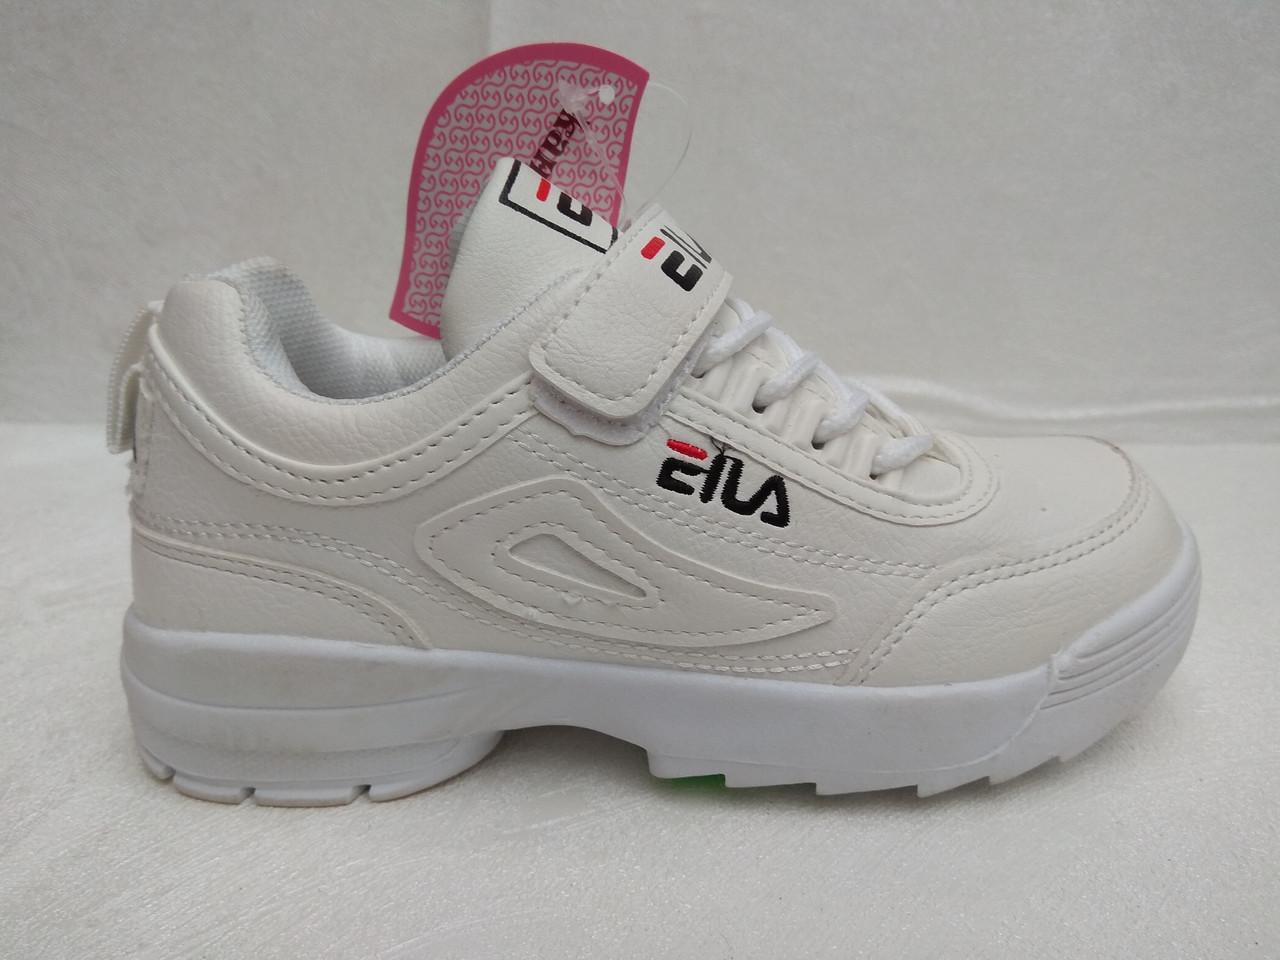 6a495ae7b Детские кроссовки оптом Канарейка 8139-5 (р.32-37) : продажа, цена в ...